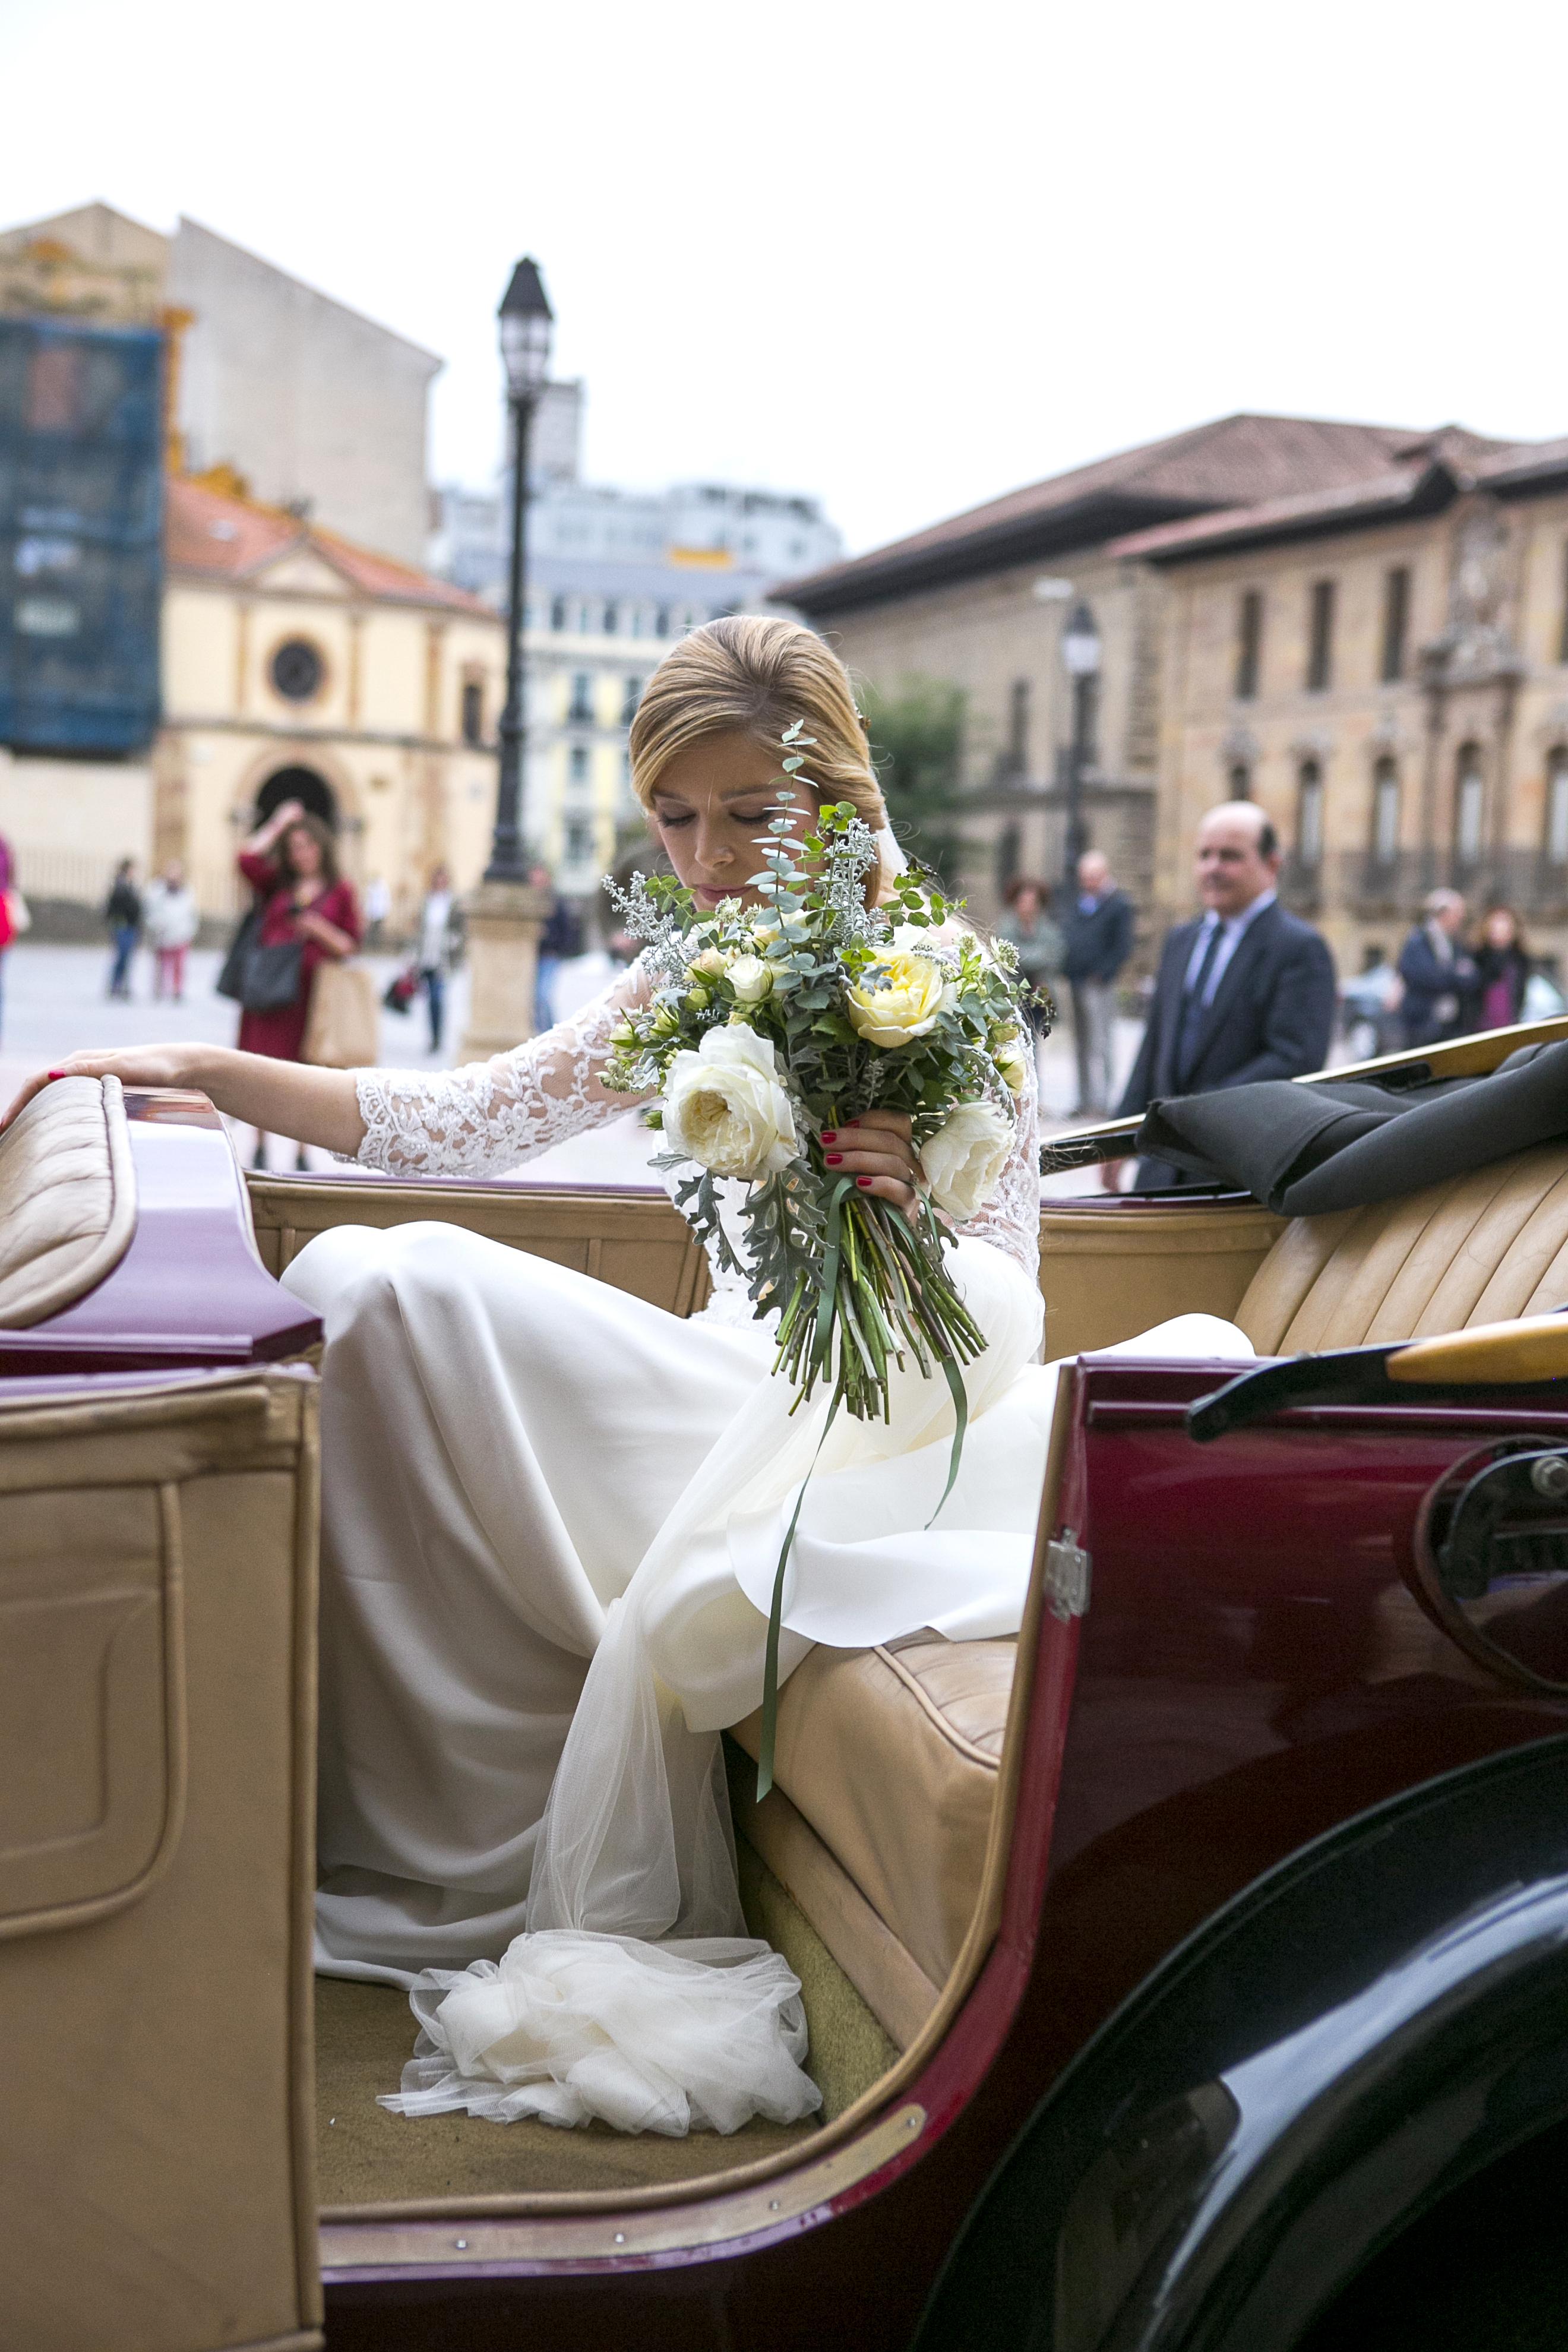 La boda de Carlota y Fede I